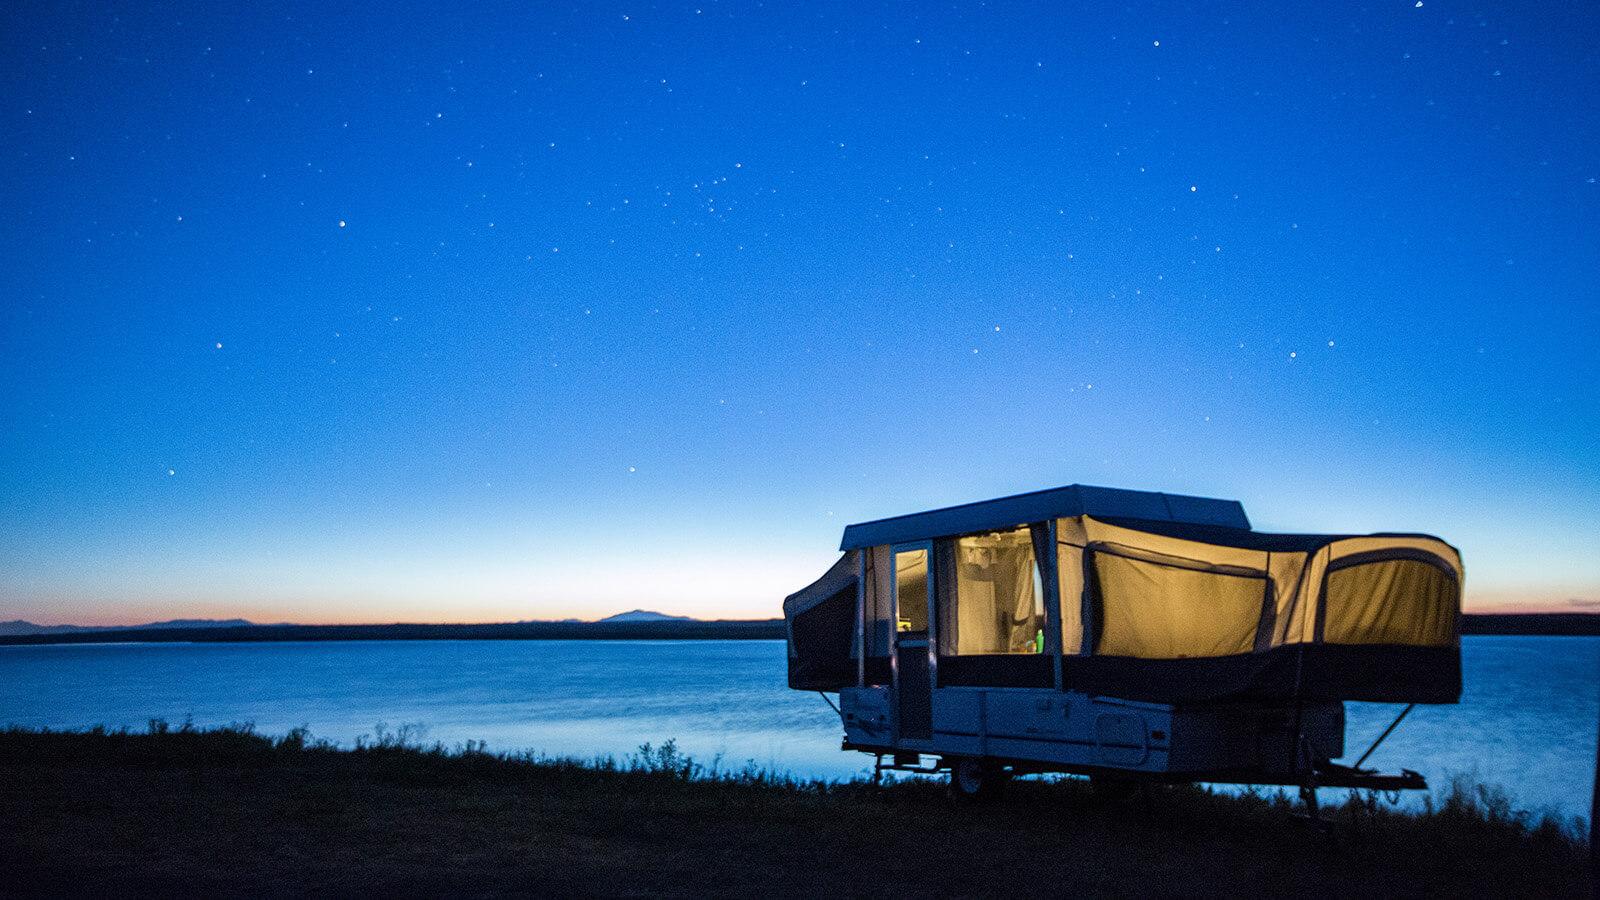 Camper under the stars